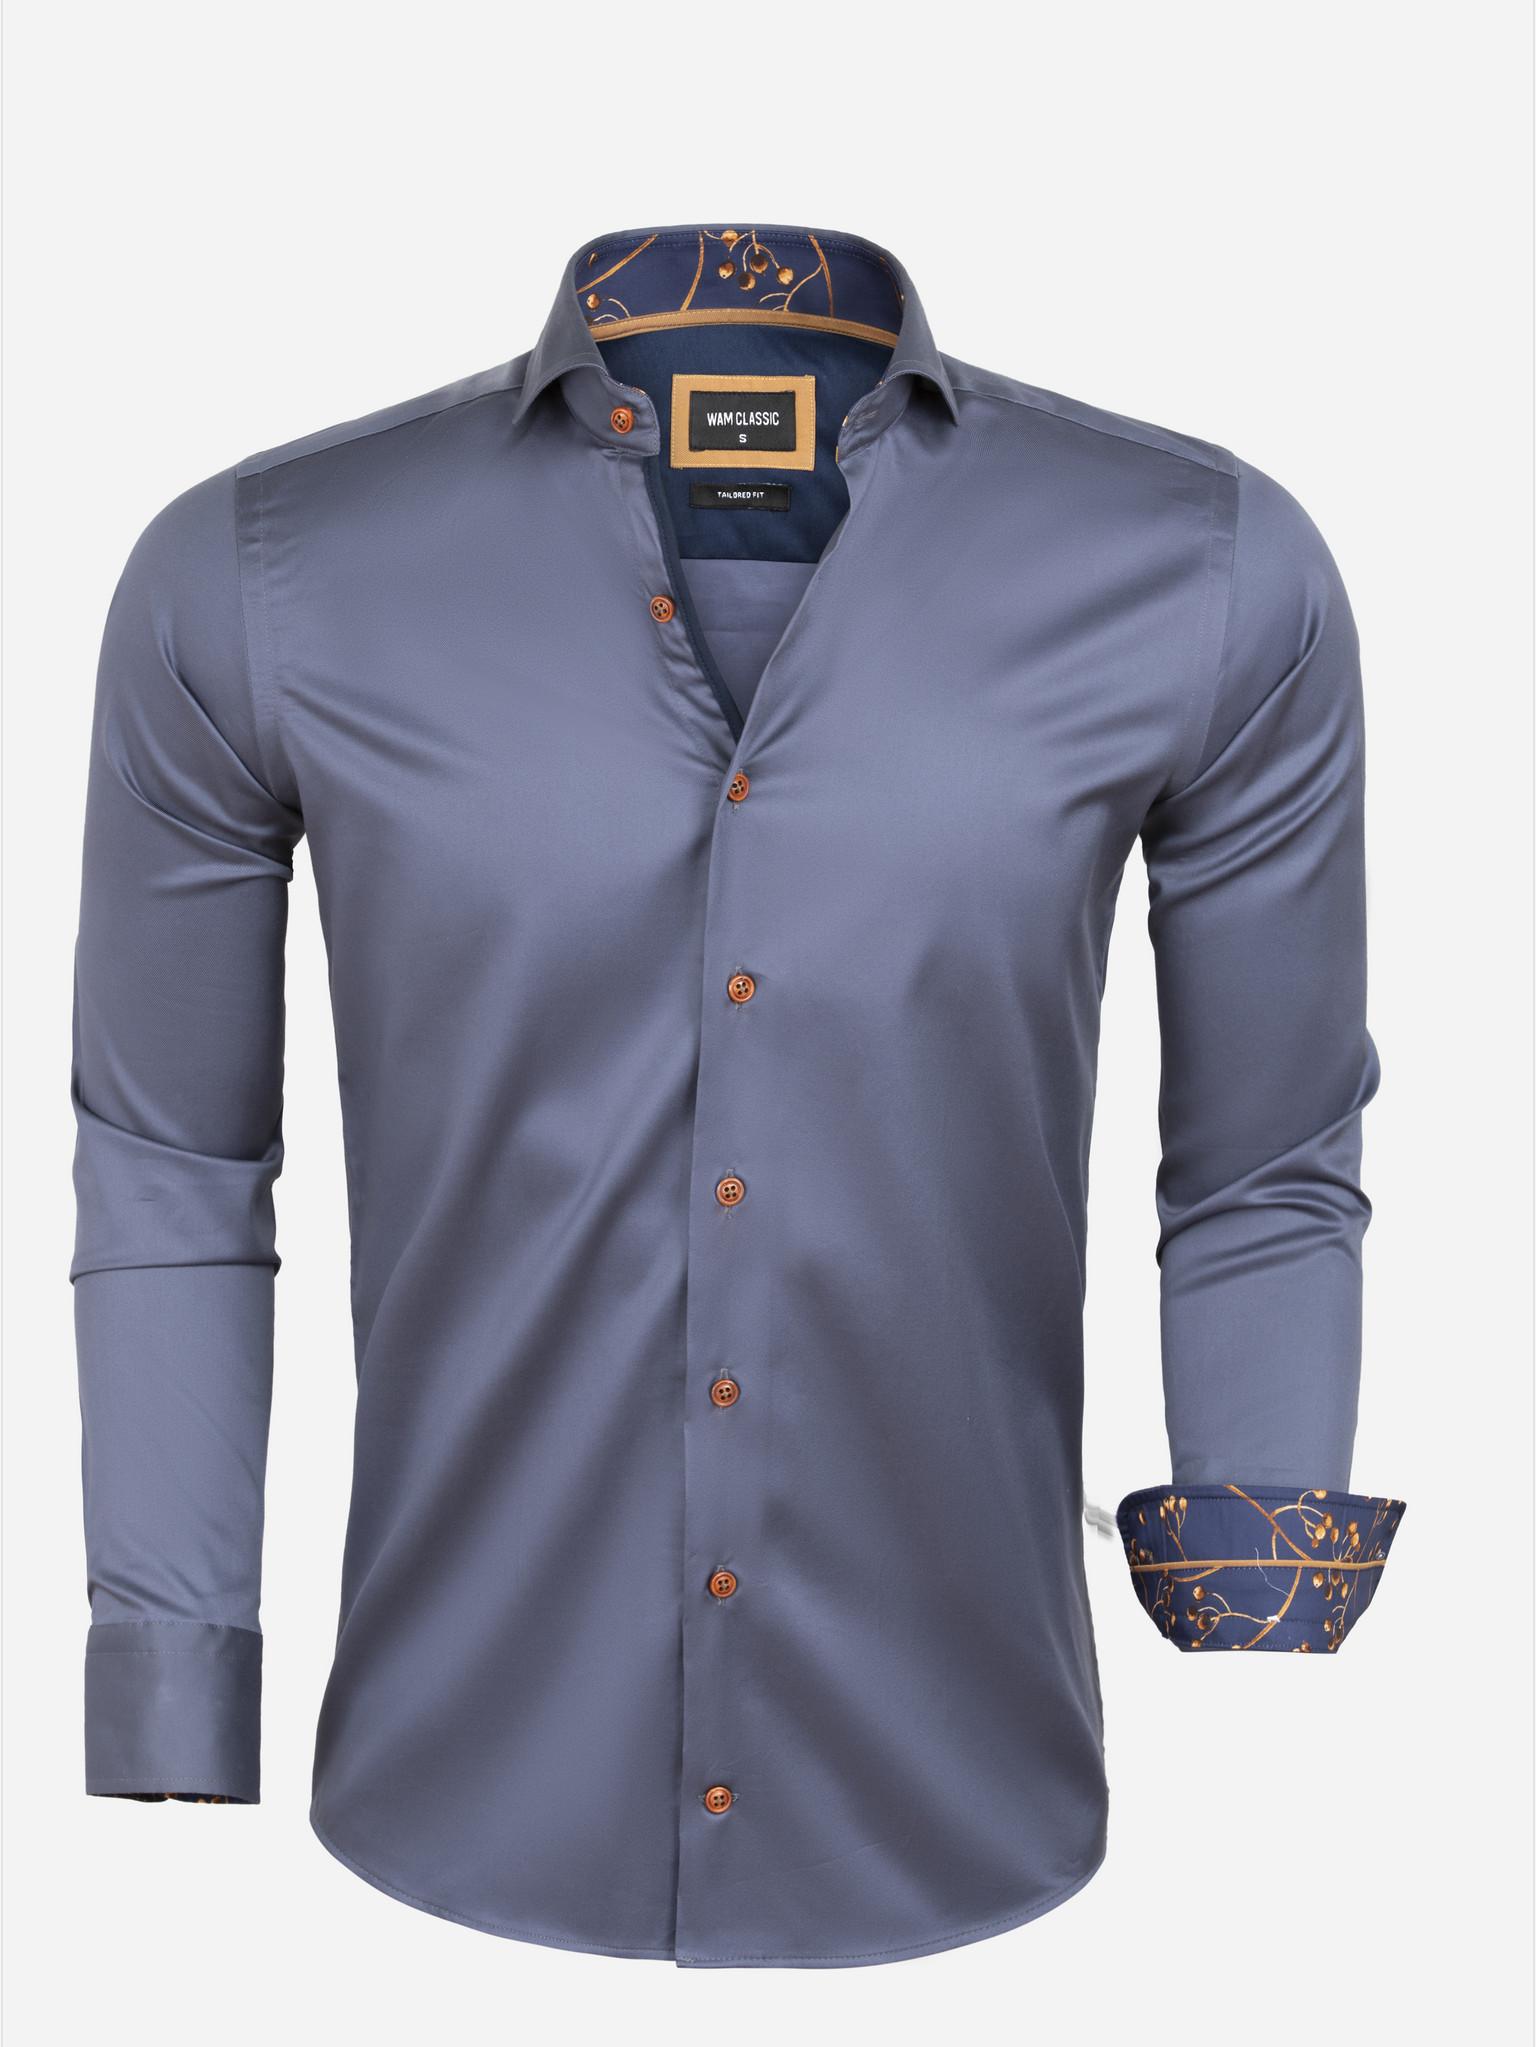 Overhemd Lange Mouw 75632 Aveiro Anthracite